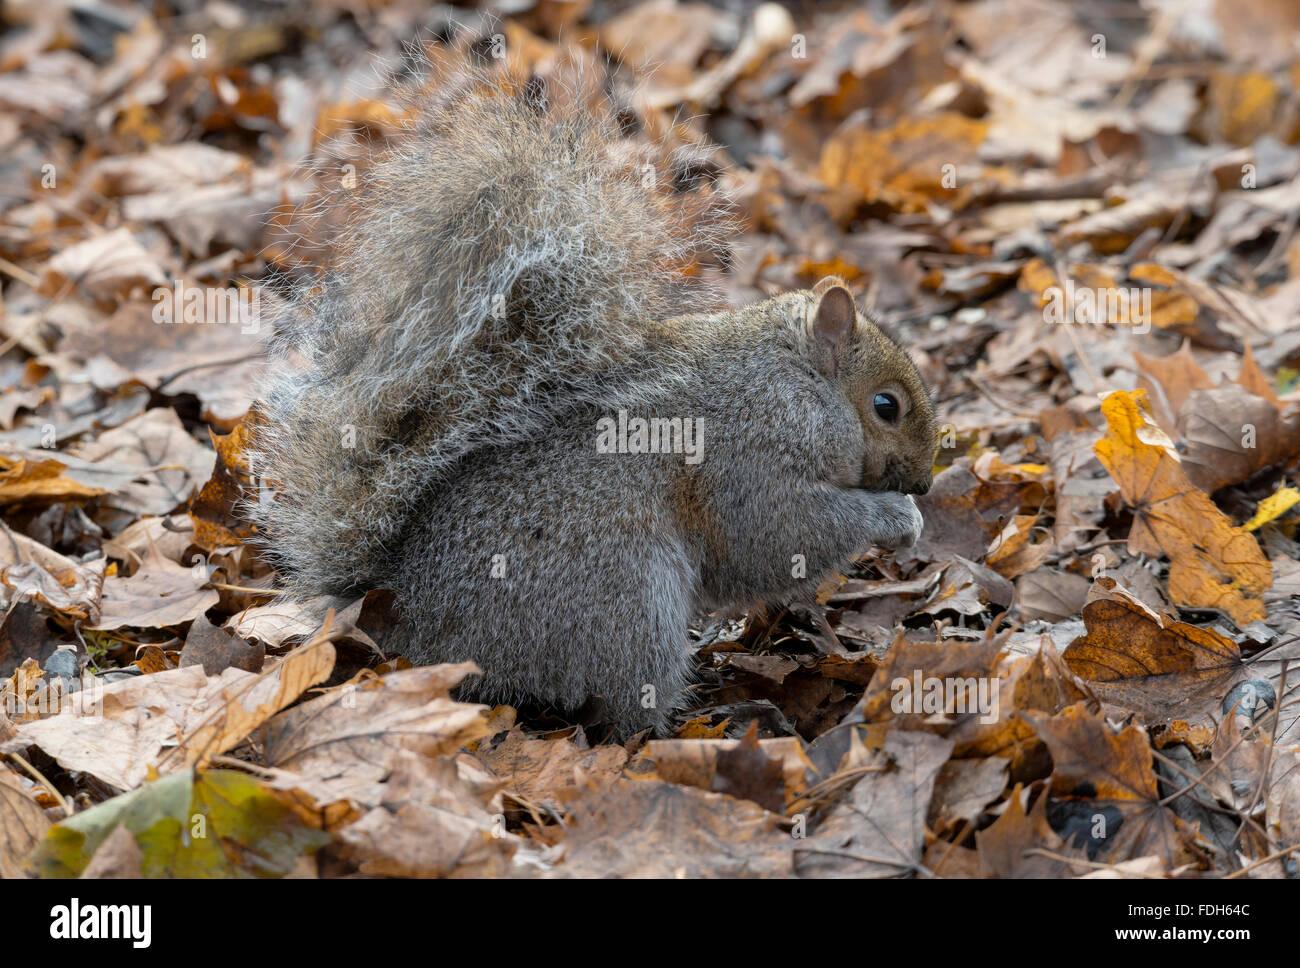 Eastern Gray Squirrel (Sciurus carolinensis) on forest floor, eating nuts, Autumn, E North America - Stock Image